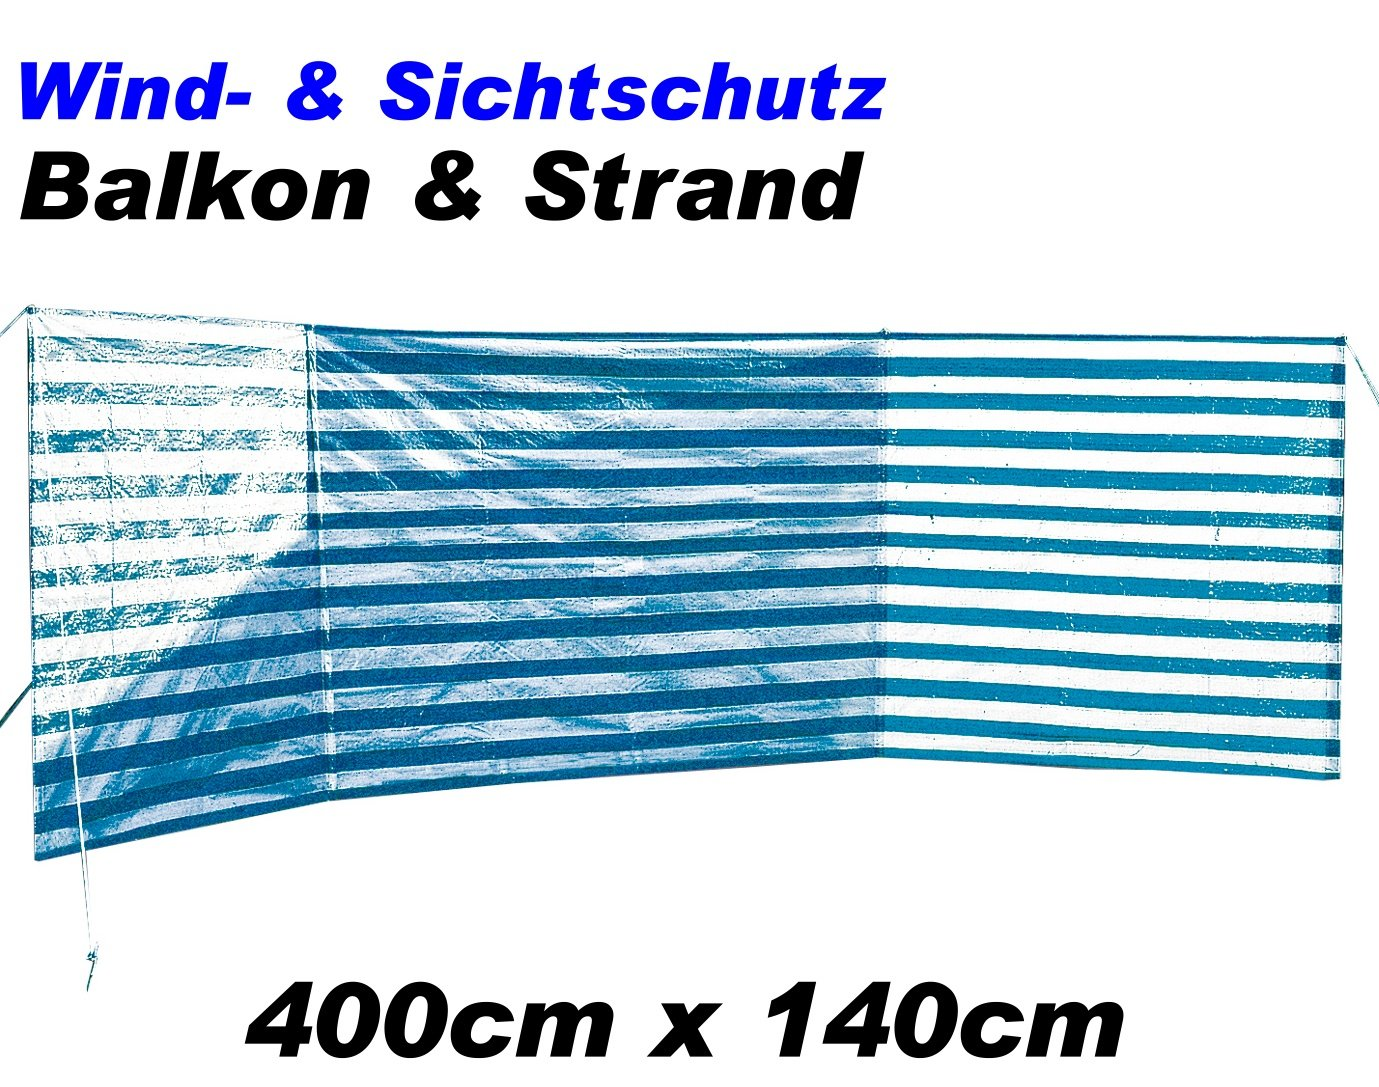 Xl Windschutz 400x140cm Garten Strand Etc 15395 Amazon De Garten